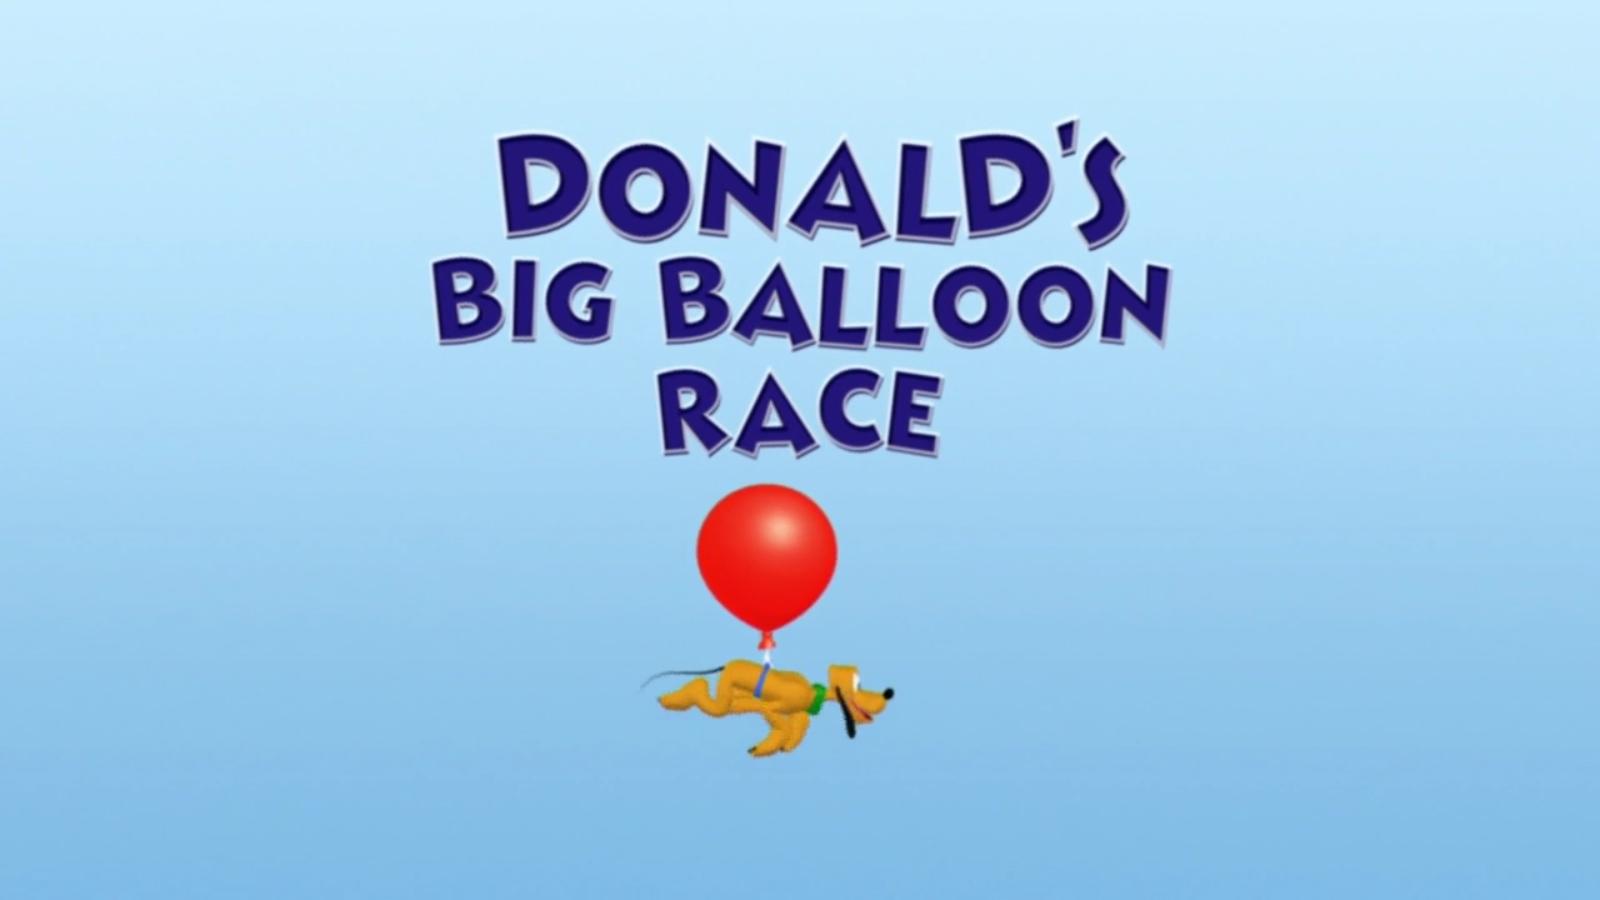 Donald's Big Balloon Race